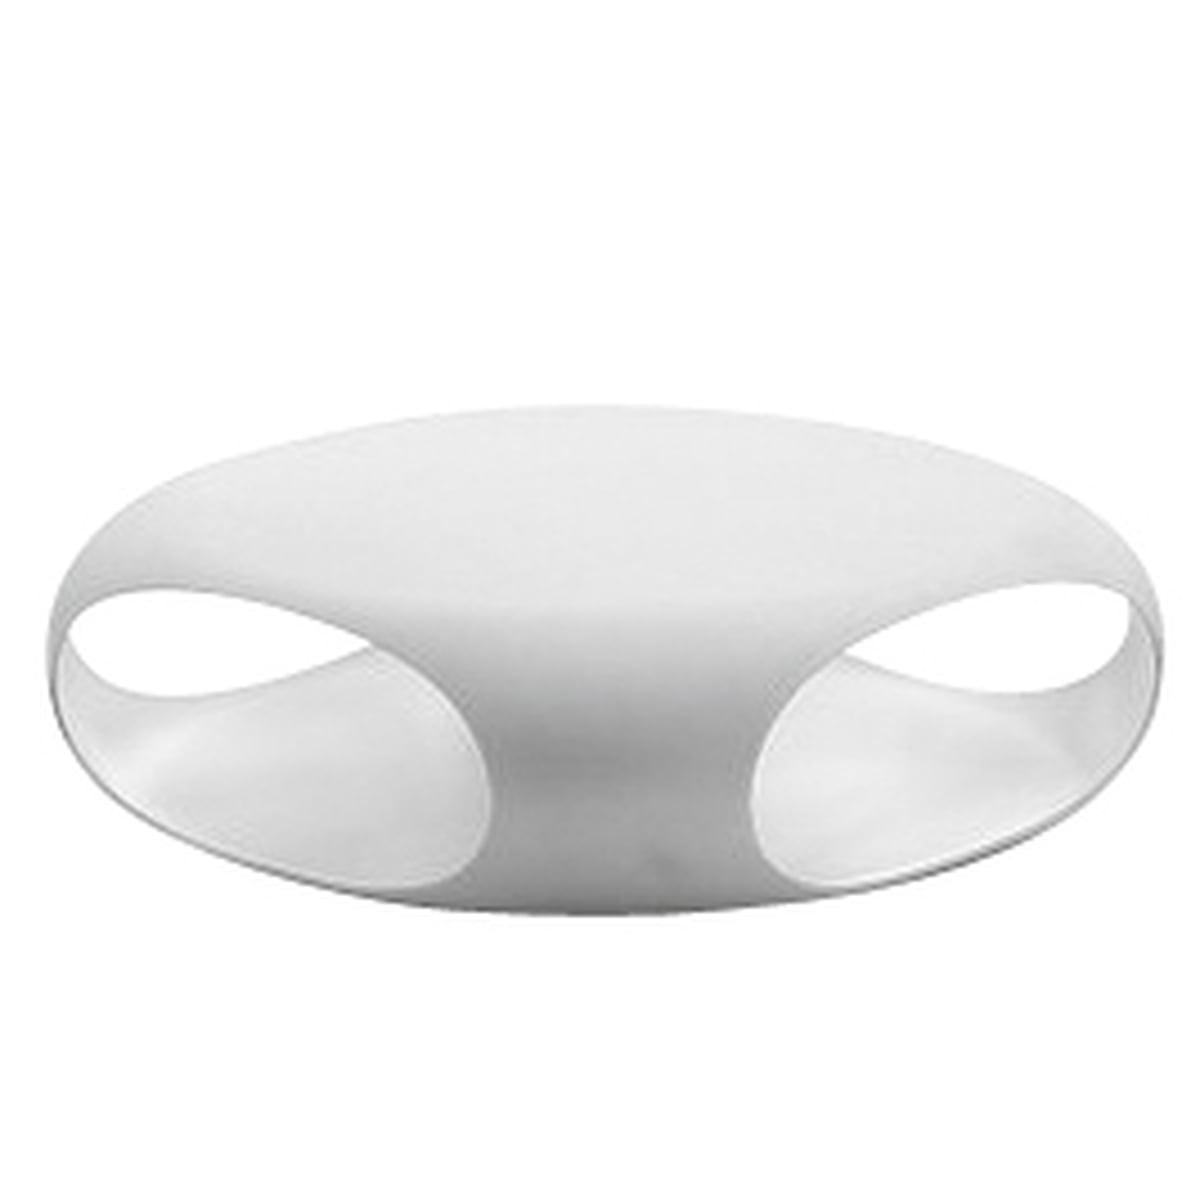 Pebble sofatisch von bonaldo connox shop for Design sofatisch